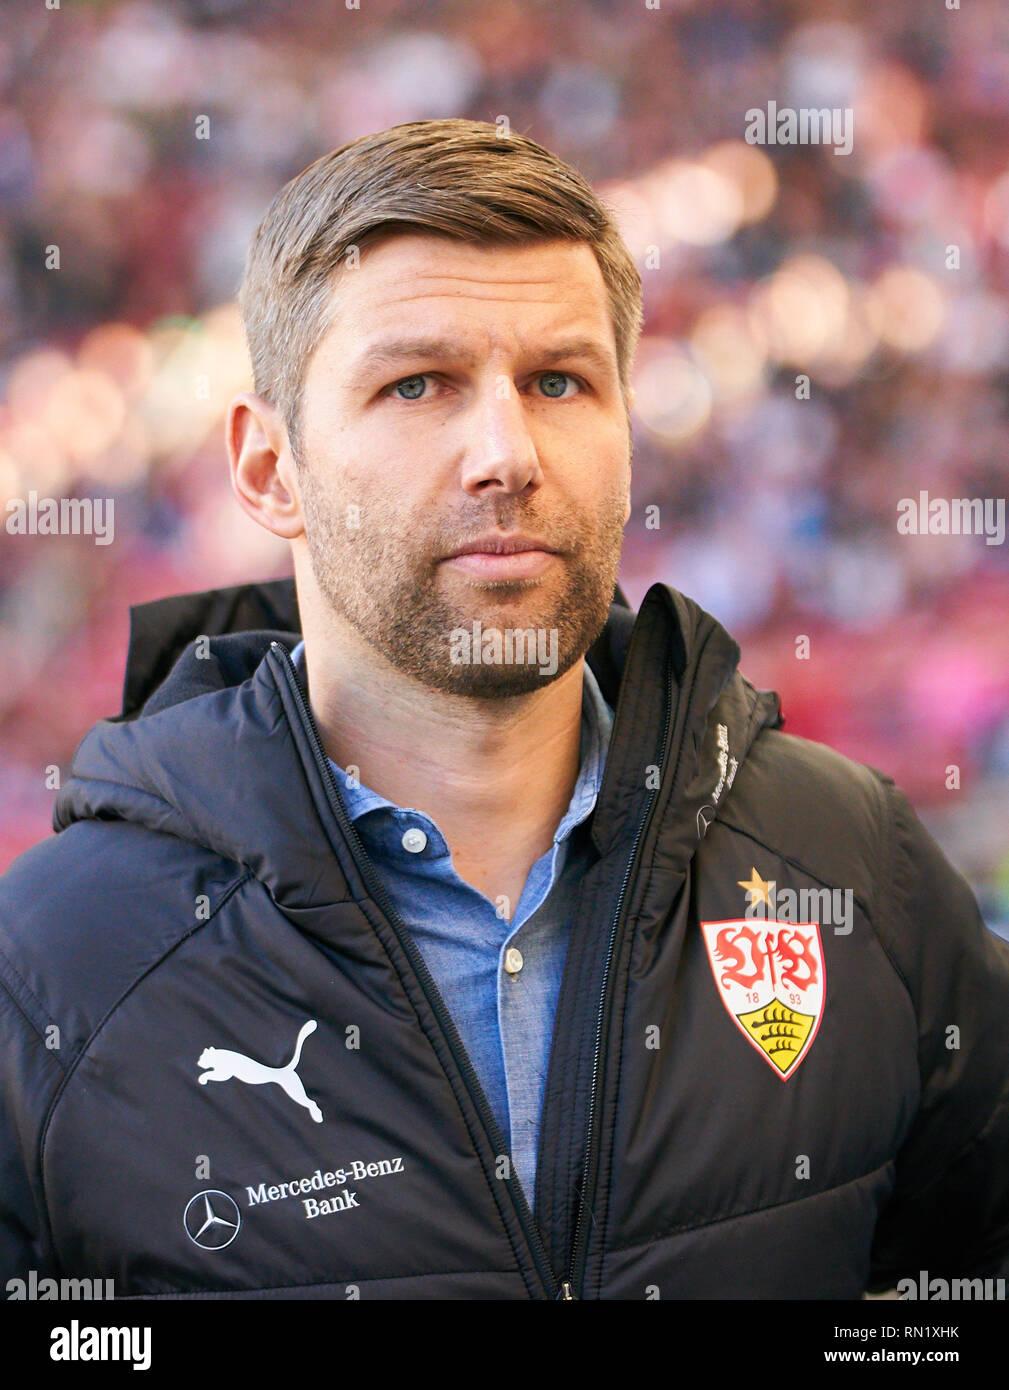 Thomas Hitzlsperger Vfb Sportdirektor Manager Sportlicher